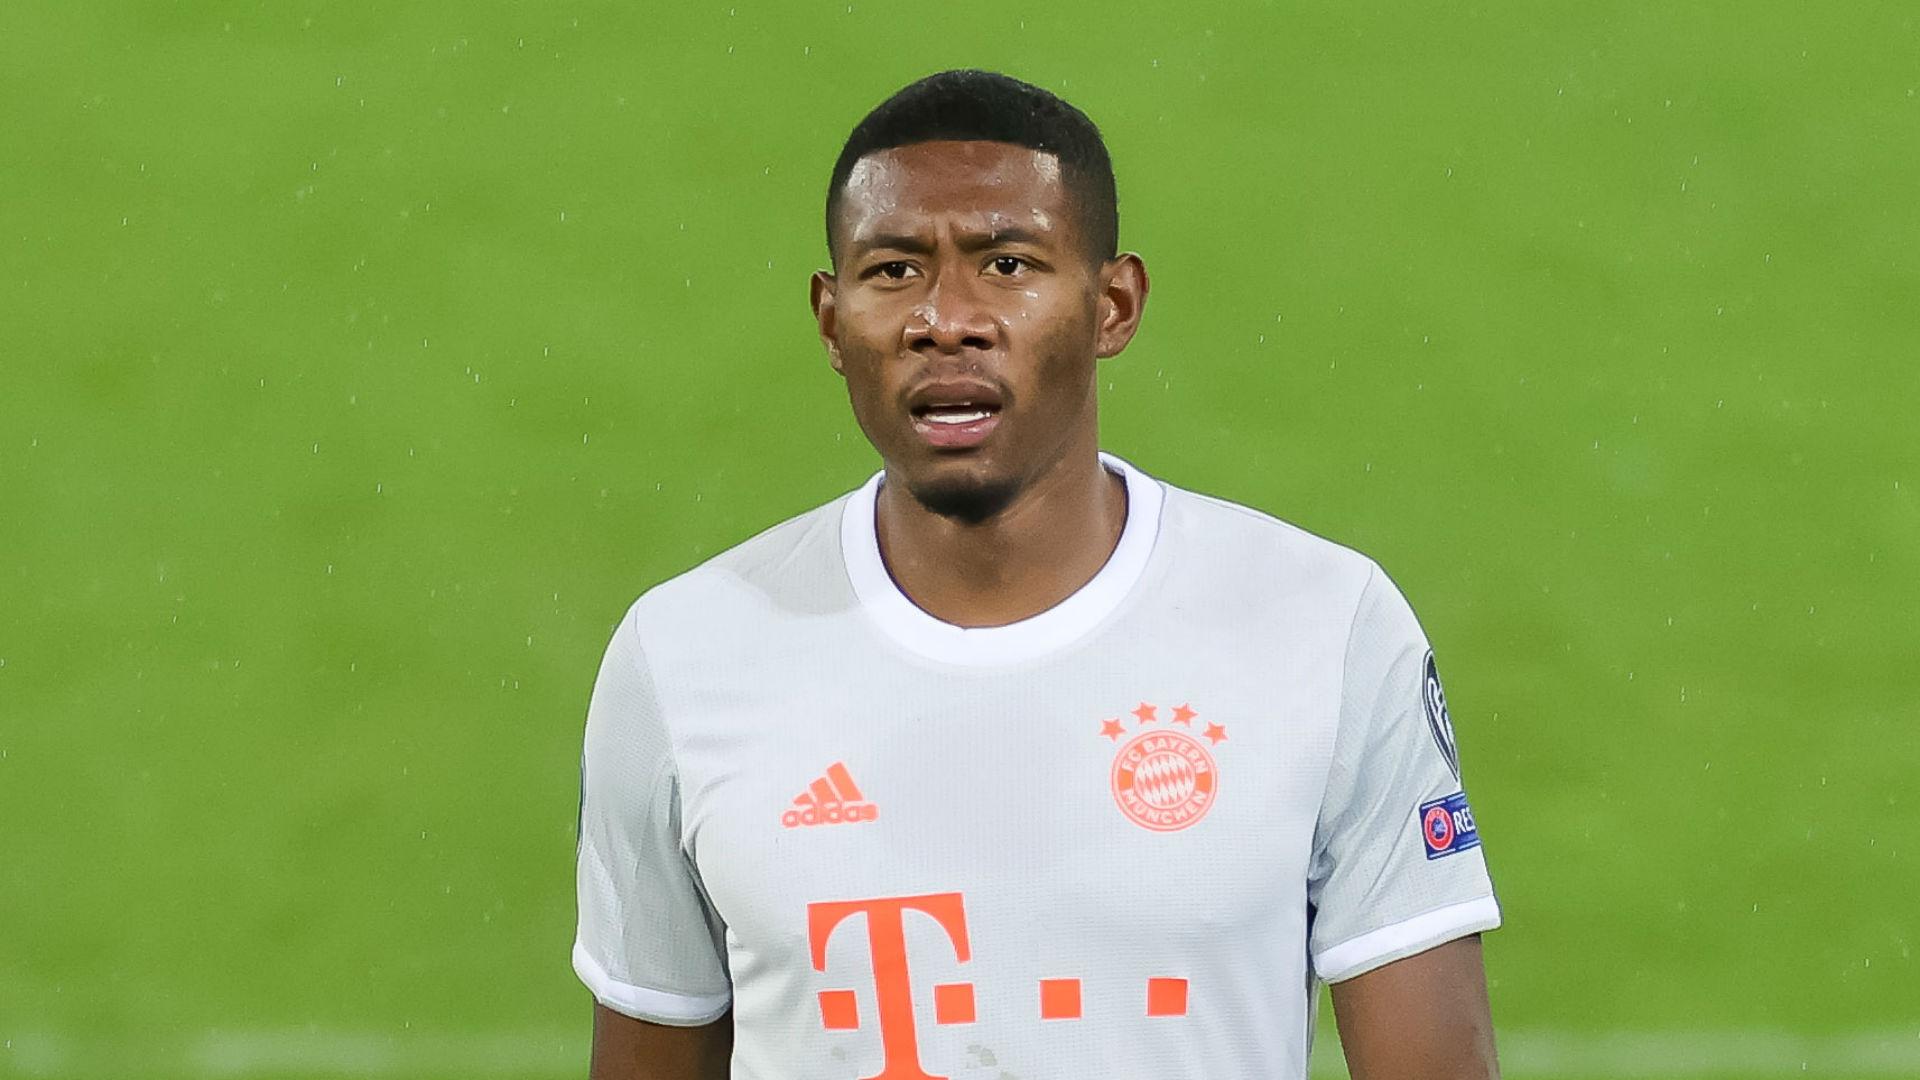 Bayern must assume Alaba will leave - Salihamidzic